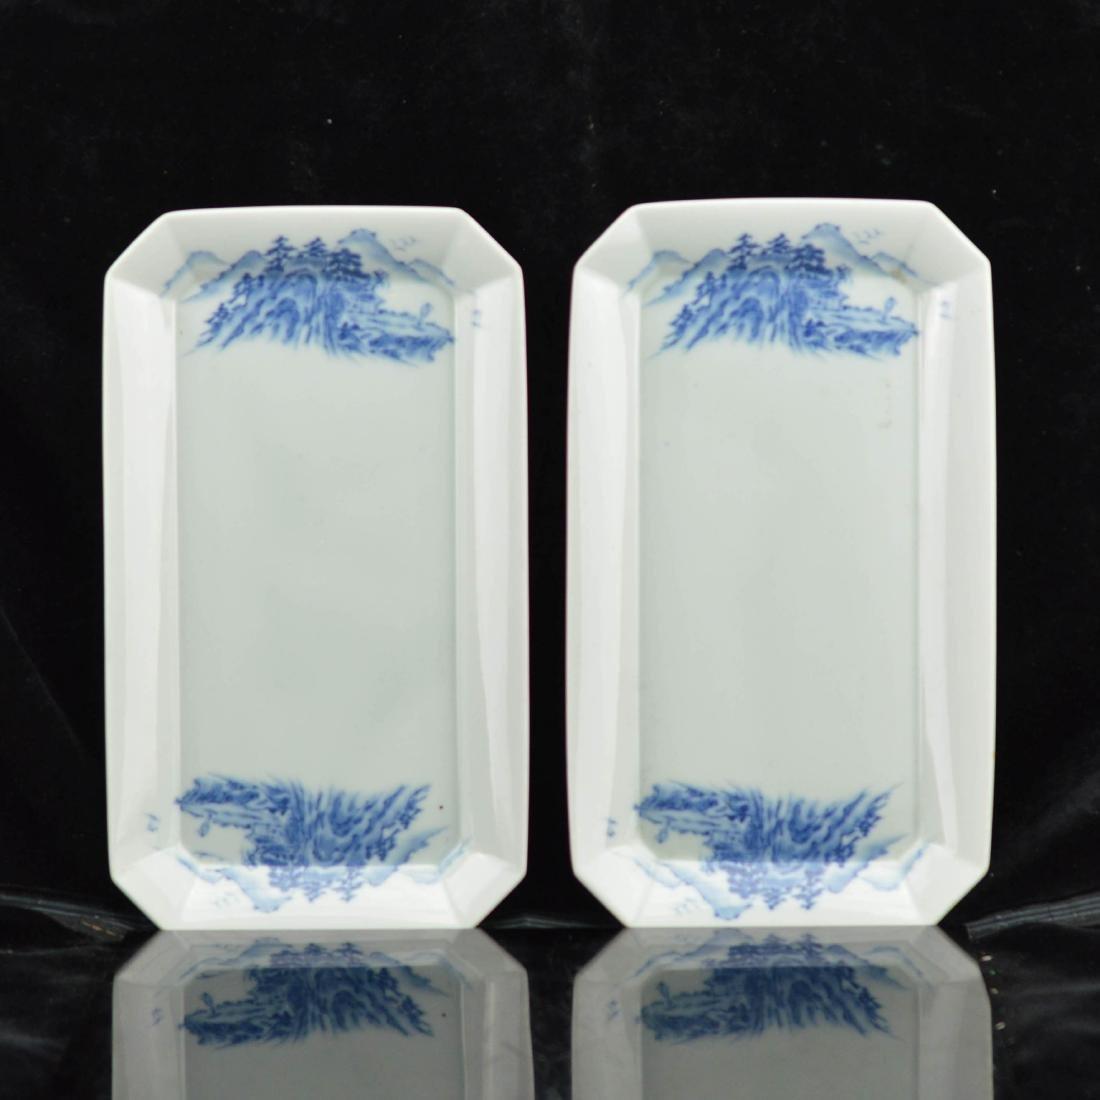 Pair of Japanese style octagonal ceramic plates